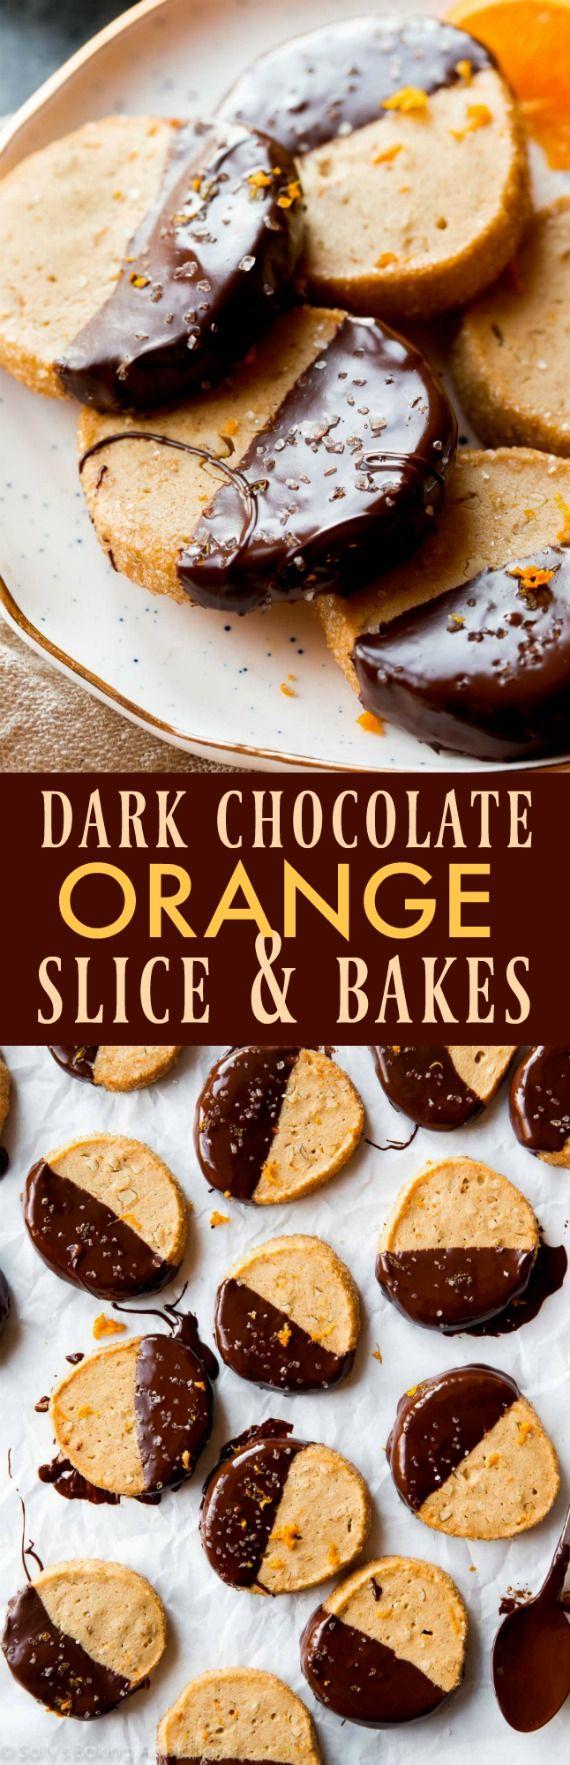 Dark Chocolate Orange Slice & Bake Cookies